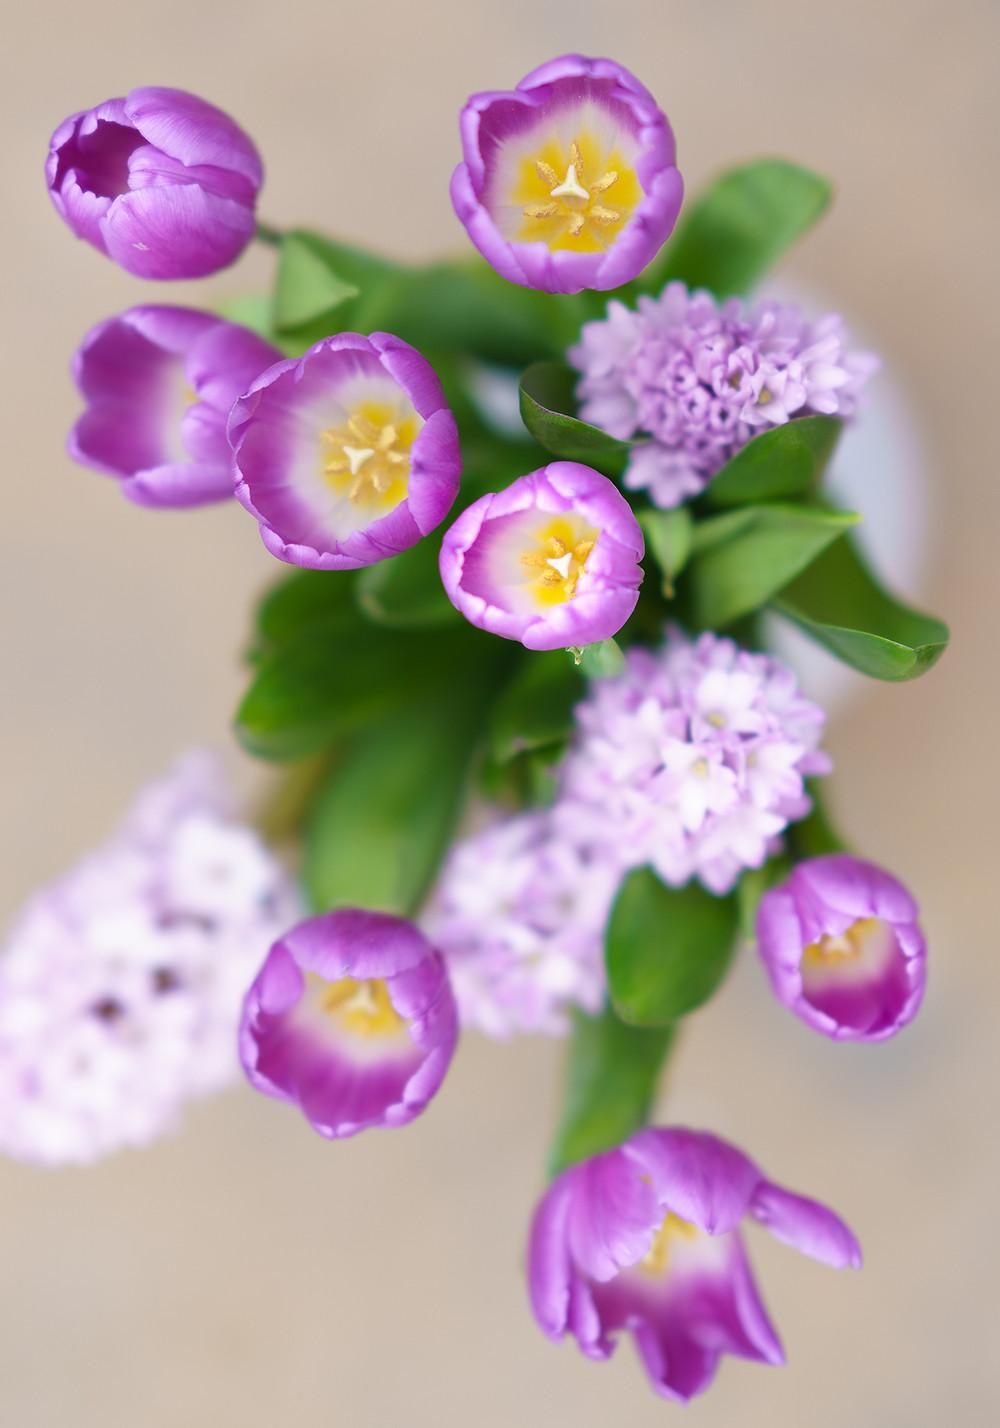 Flower Study - Natural Light